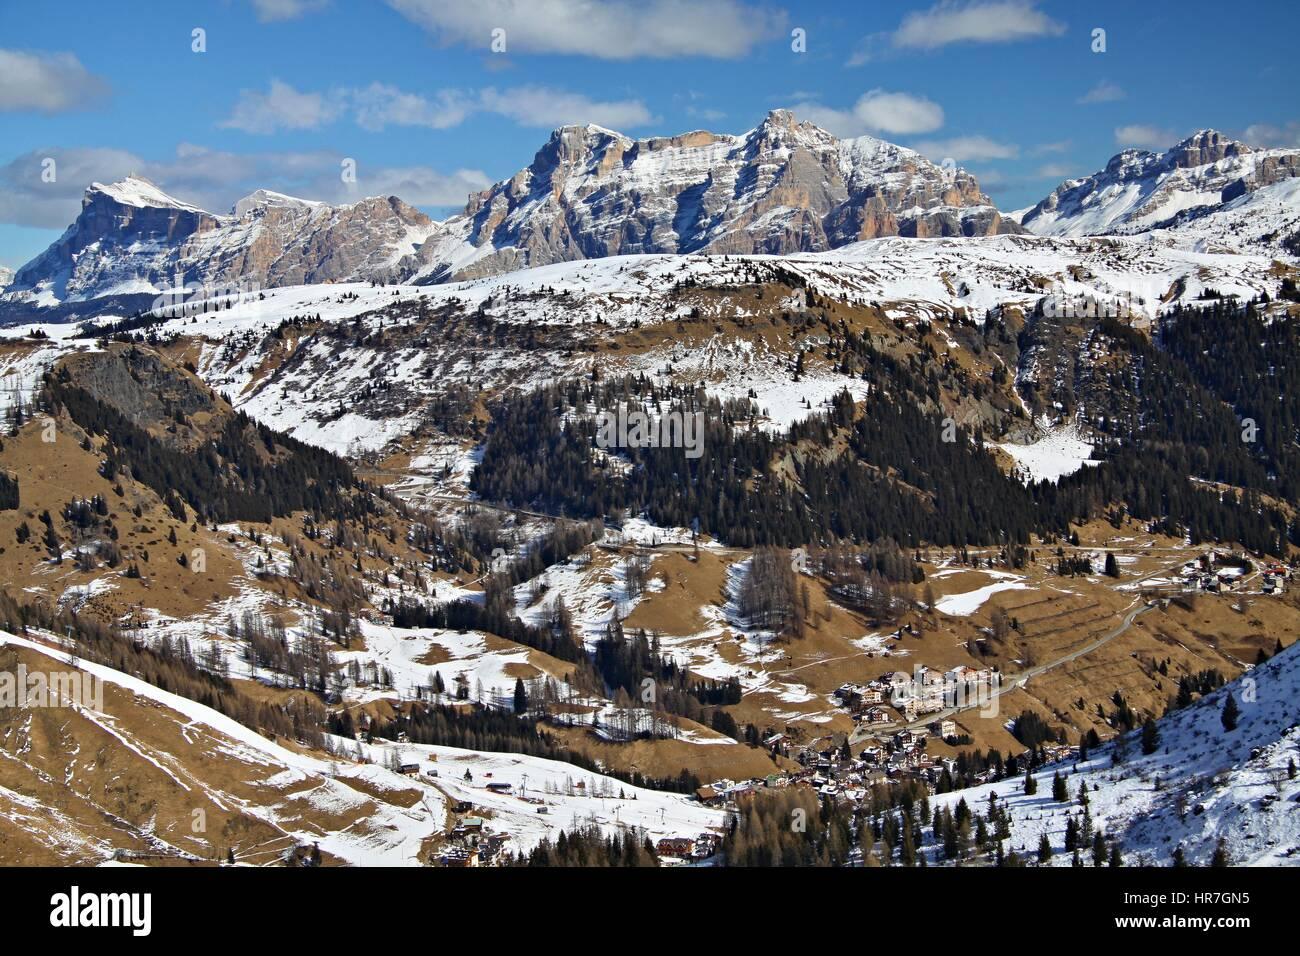 Ende des Winters in den Dolomiten, Blick von der oberen Forcella Porta Vescovo, Ski Gebiet Sella Ronda, Arabba, Stockbild